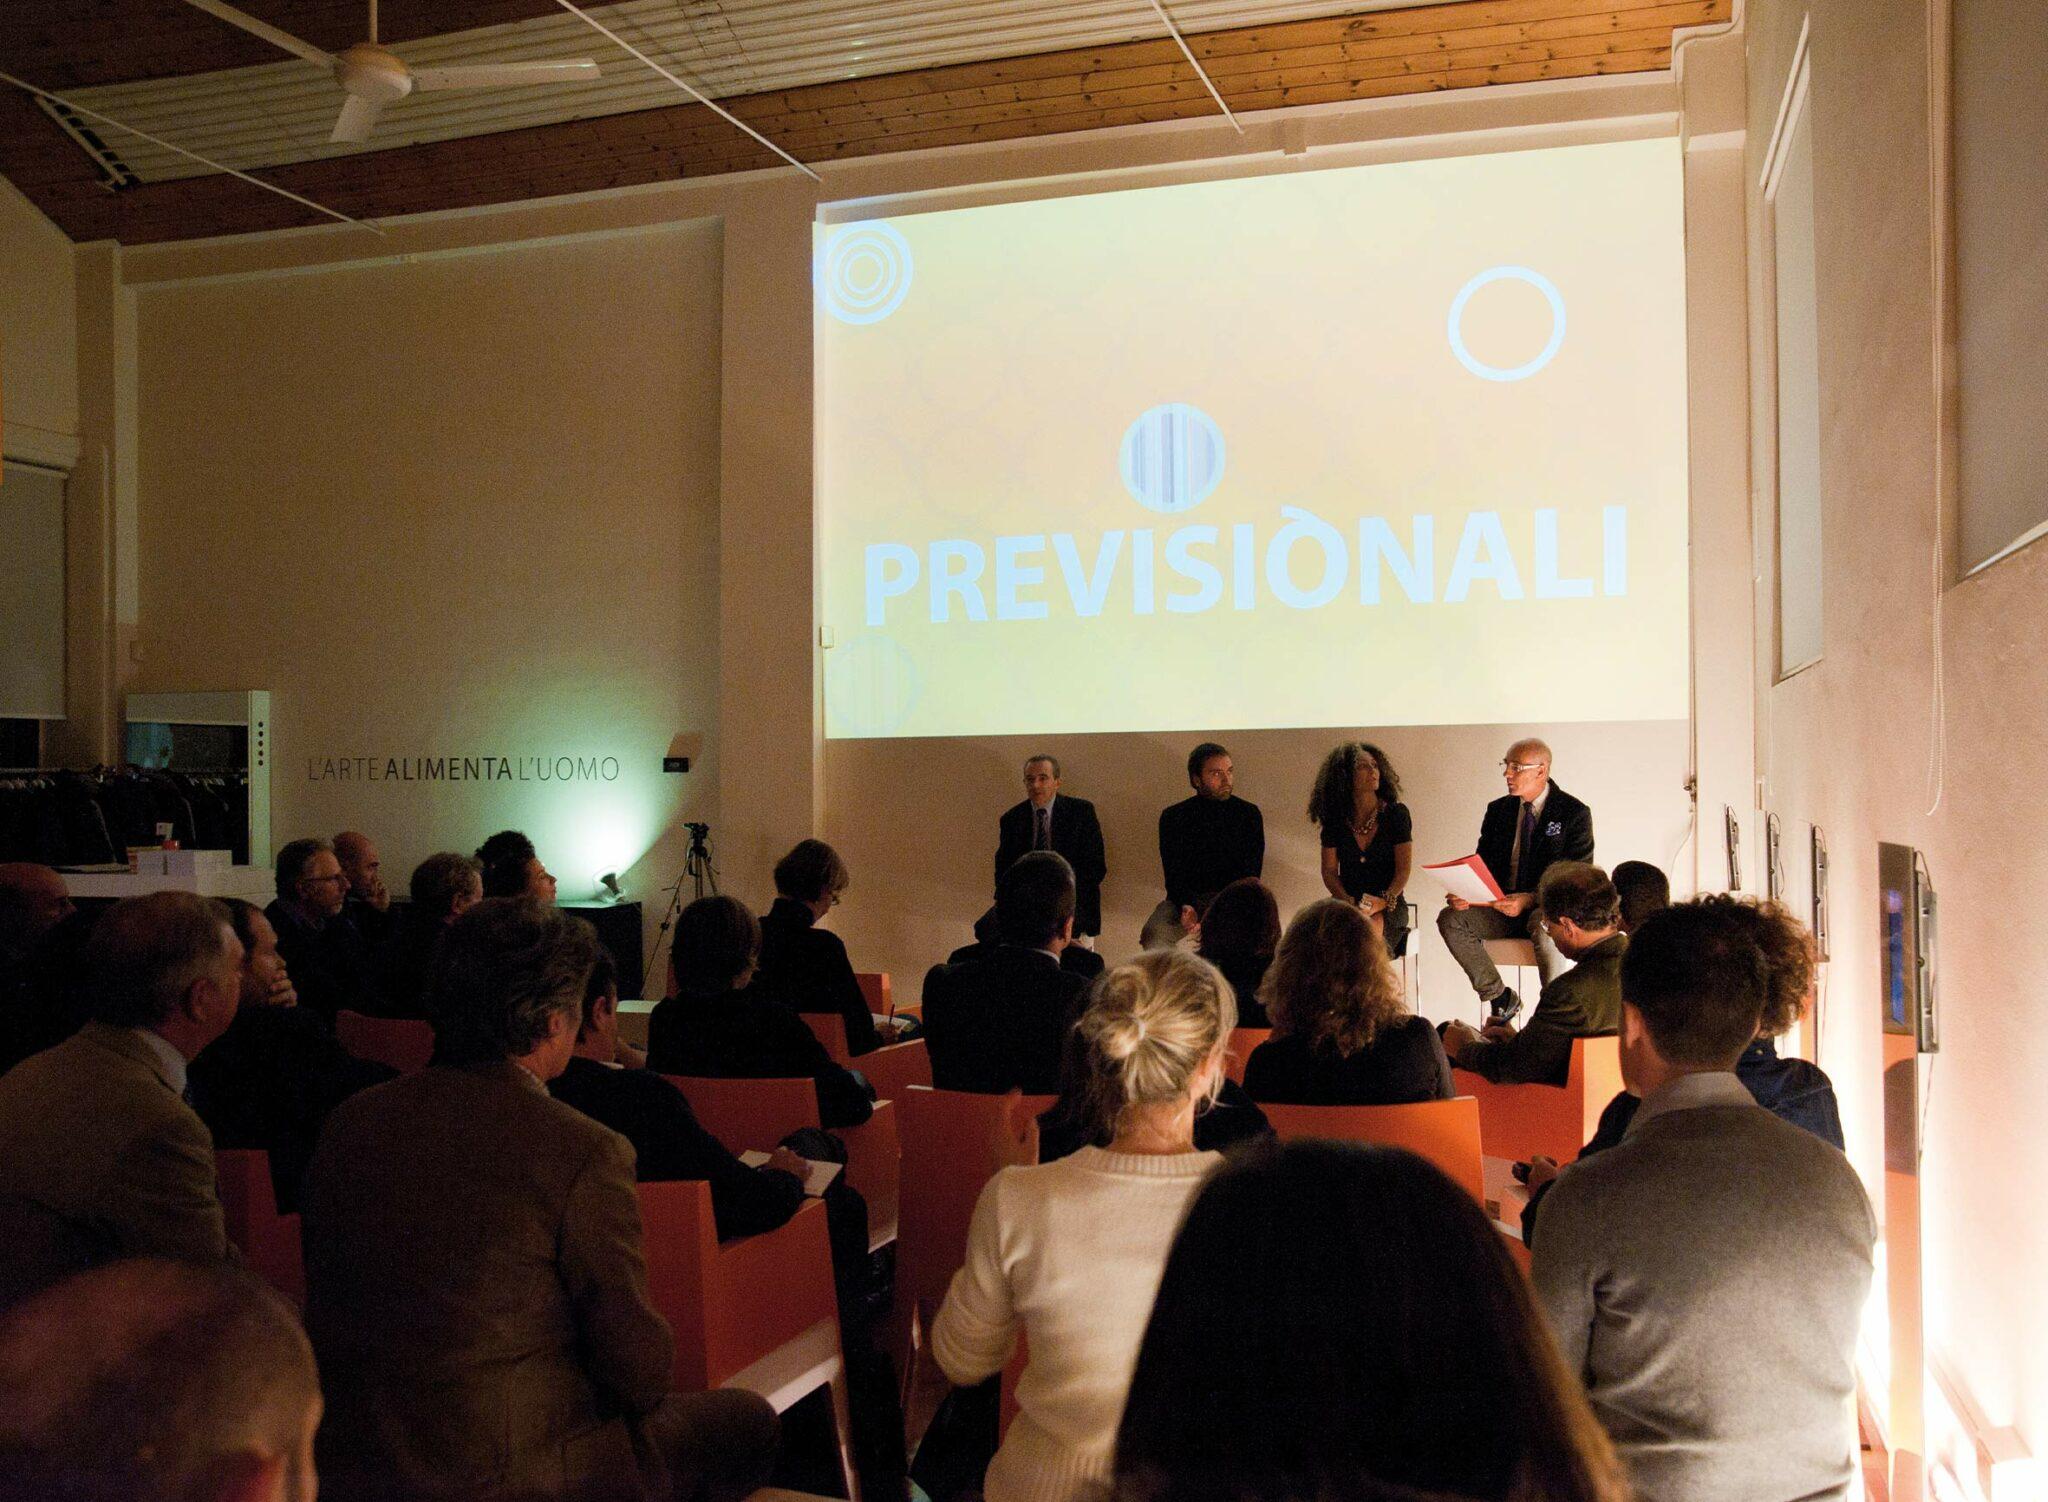 SC-studio-chiesa-communication_culture-Nutrimentum_Castelvecchio_10